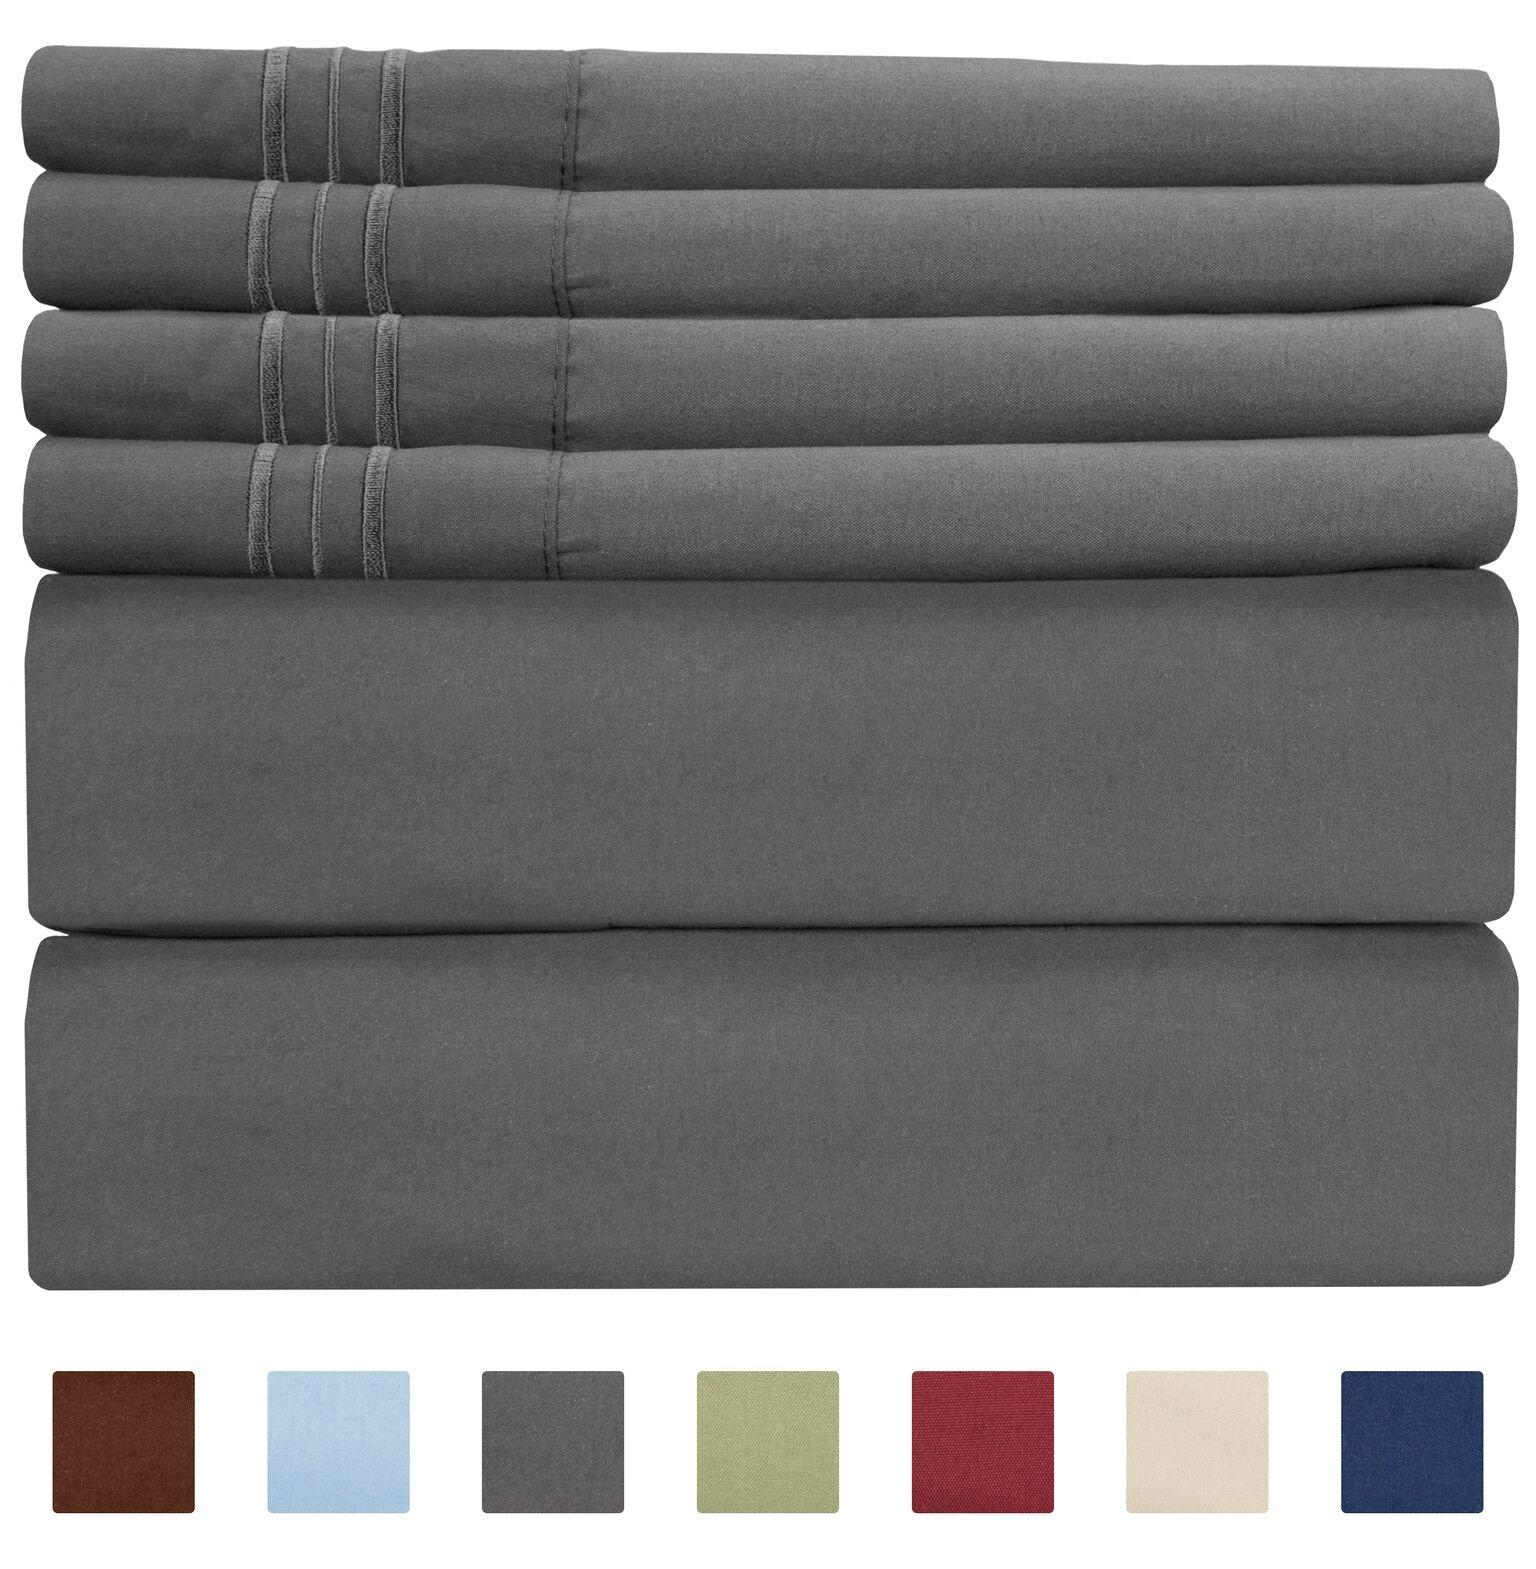 CGK Unlimited Extra Deep Pocket Sheets - Super Deep Pocket Bed Sheet Set - Deep Fitted Flat Sheet - Deep Queen Sheets Dark Grey - Queen Sheet